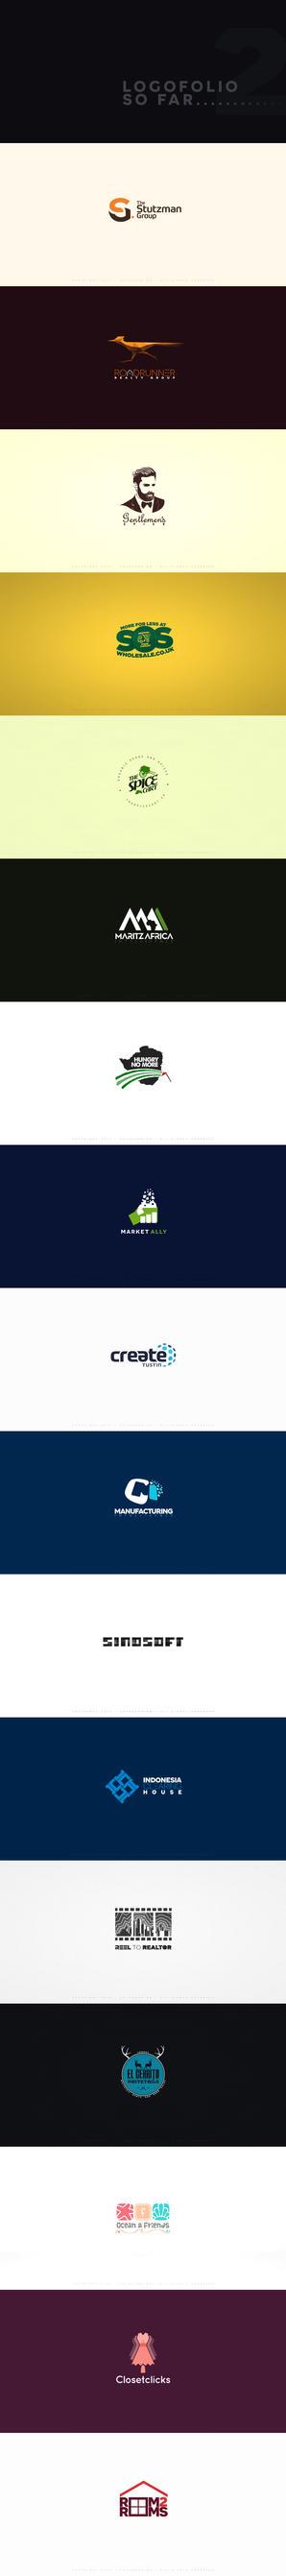 Logofolio 2 by CaJoE-Design